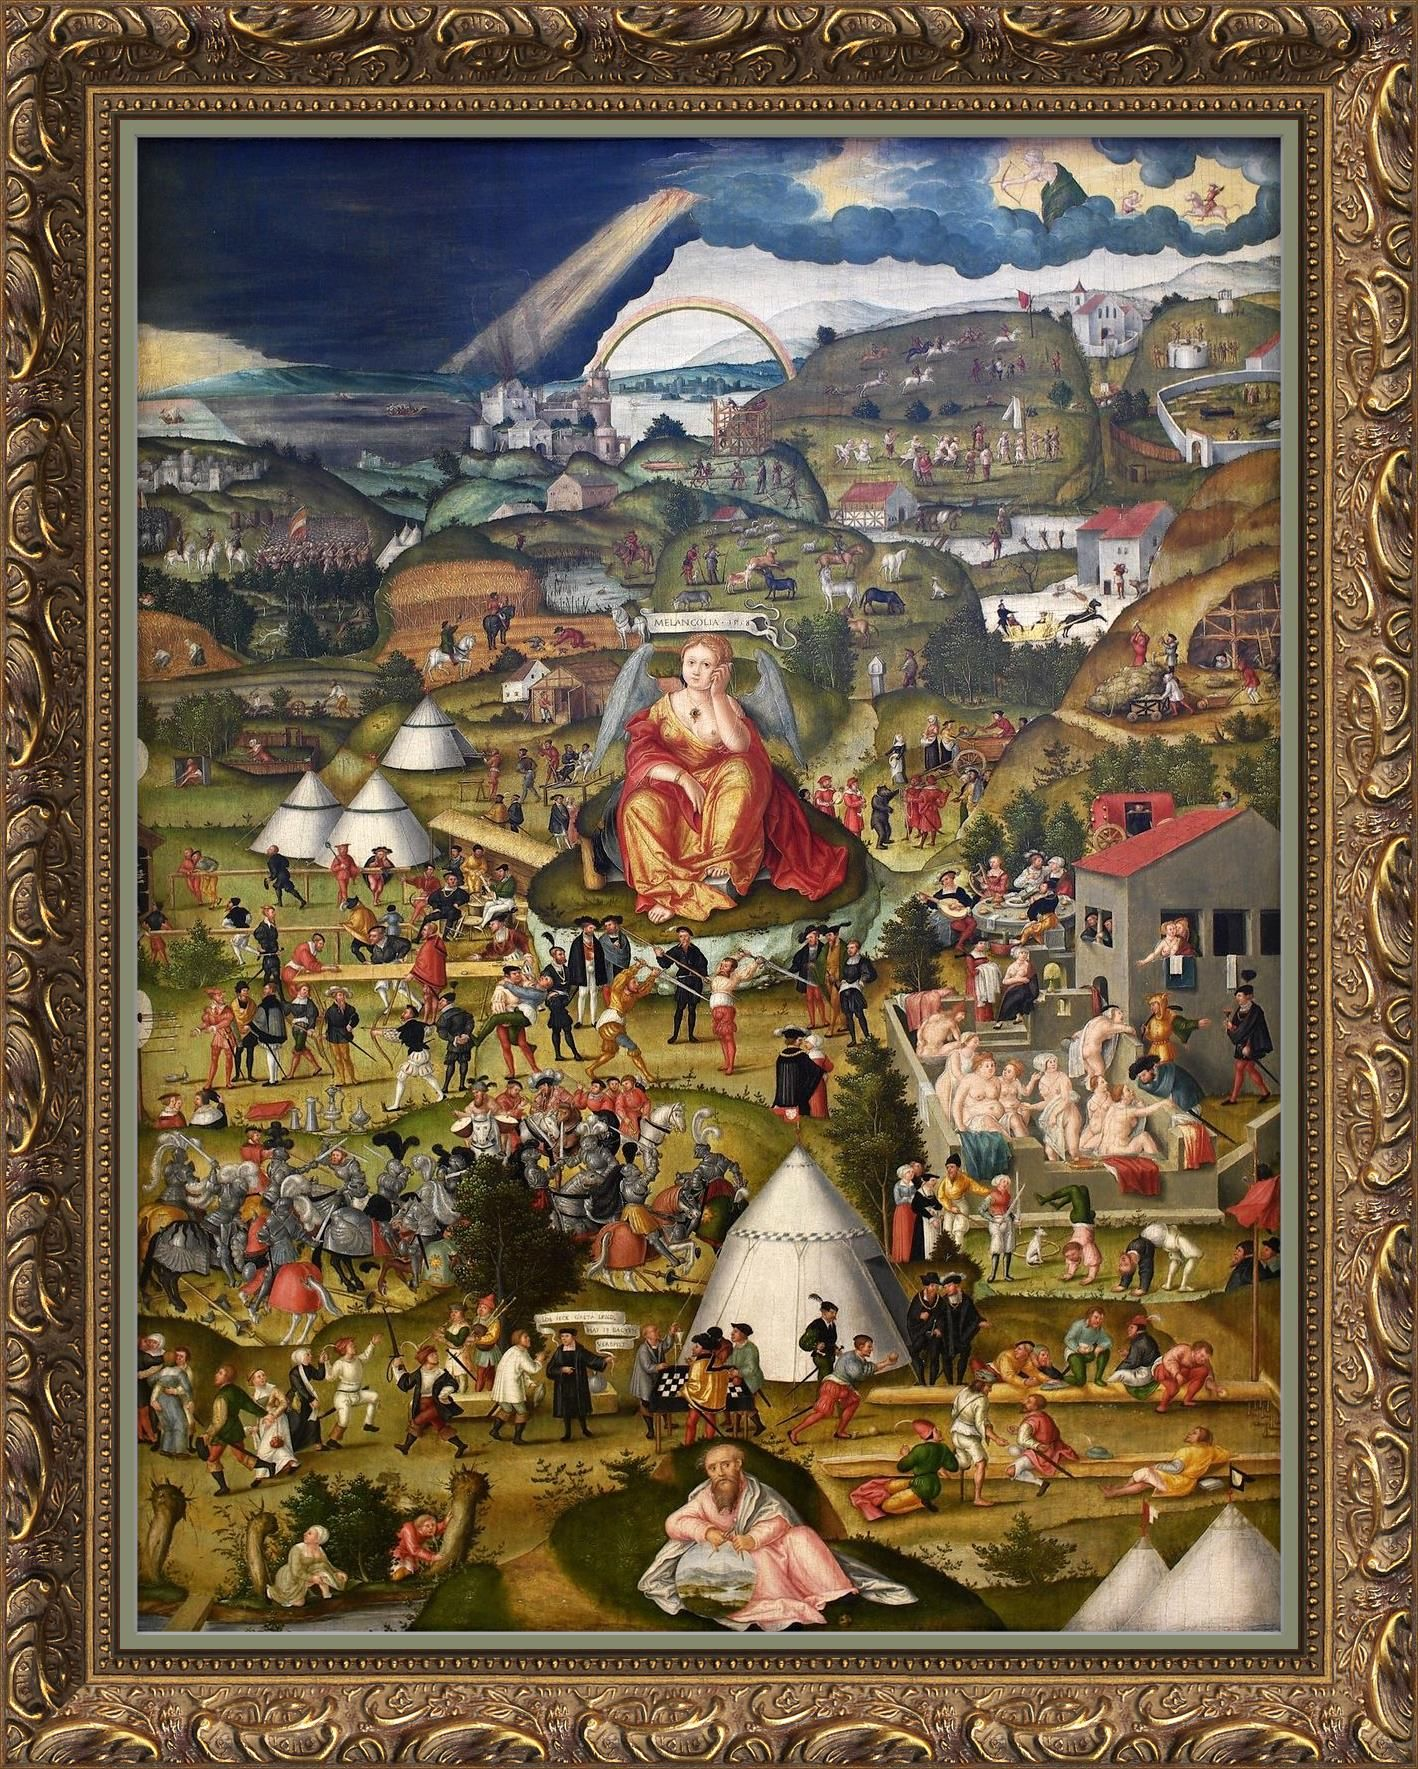 Die Melancholie Im Garten Des Lebens The Melancholy In The Garden Of Life 1558 Mixed Media On Basswood Staatliche Kunsthalle Art Art Gallery Melancholy